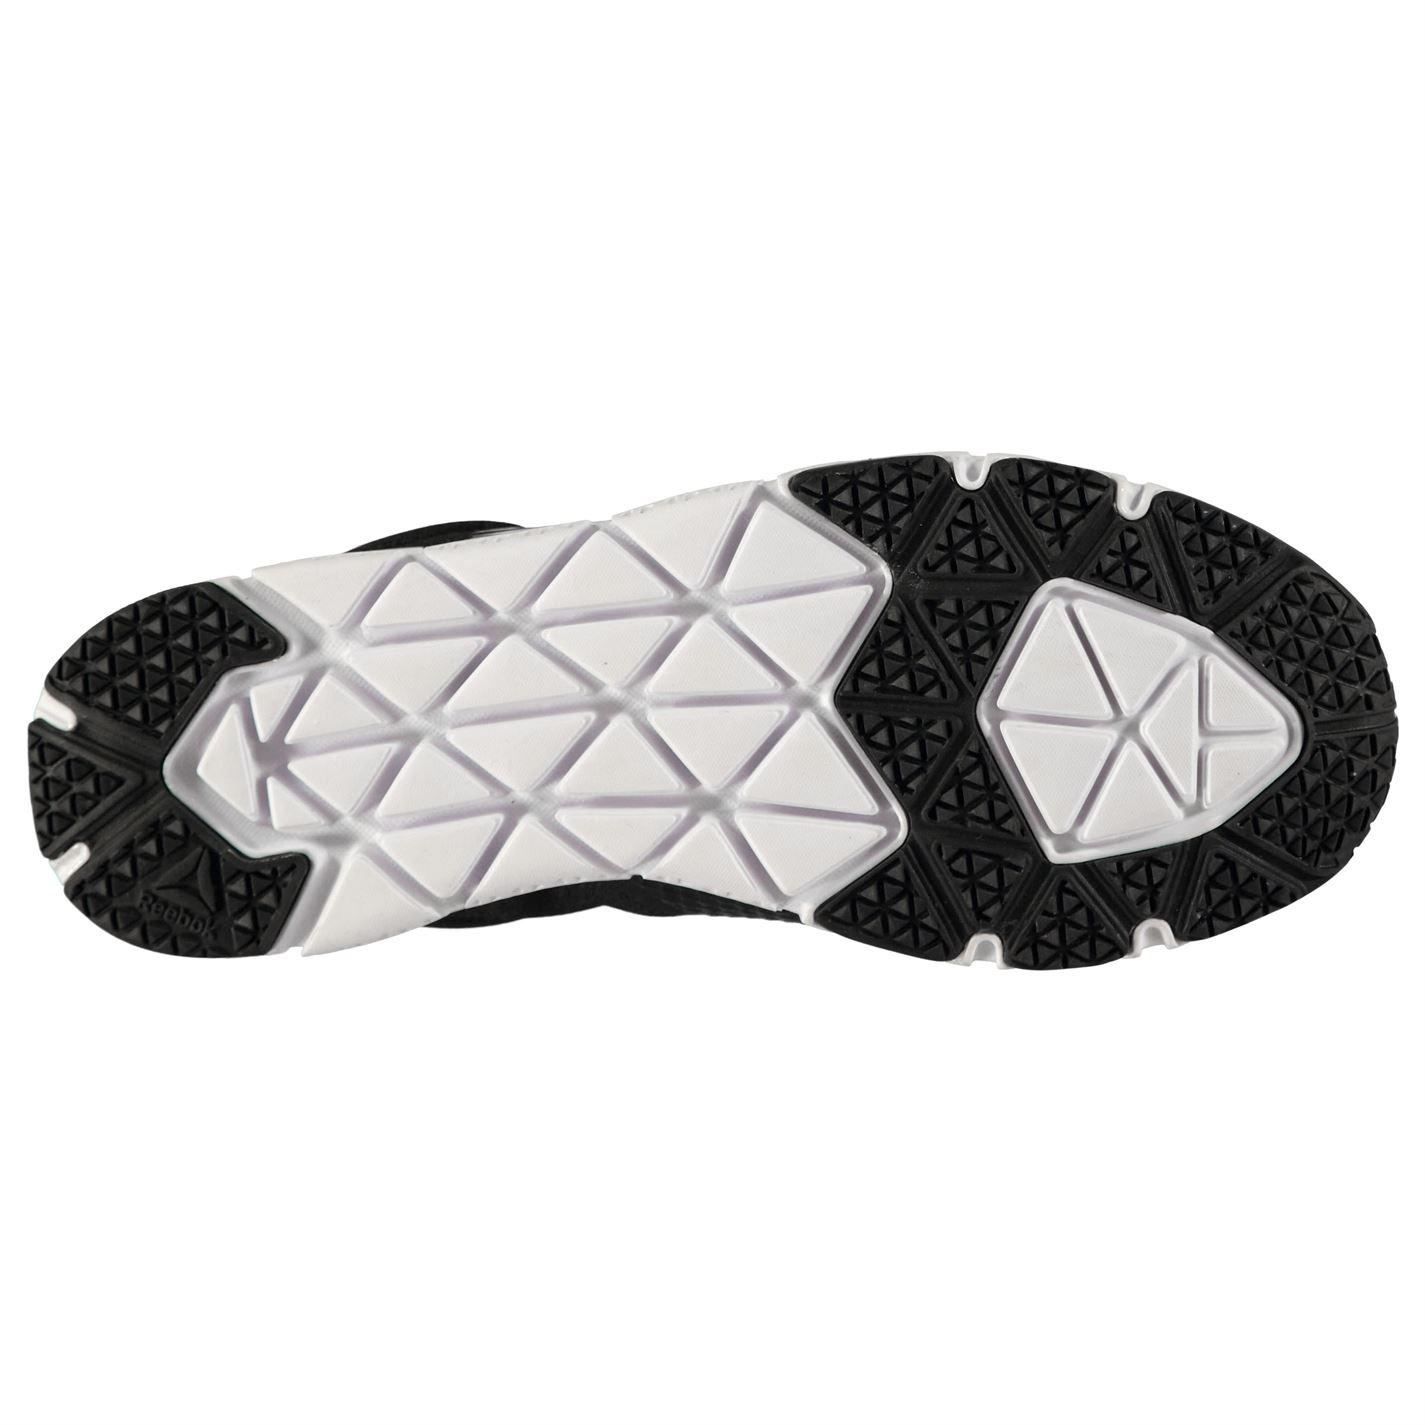 blancas de 0 2 Zapatillas Trainflex negras para Reebok deporte mujer zwHFqRFfx